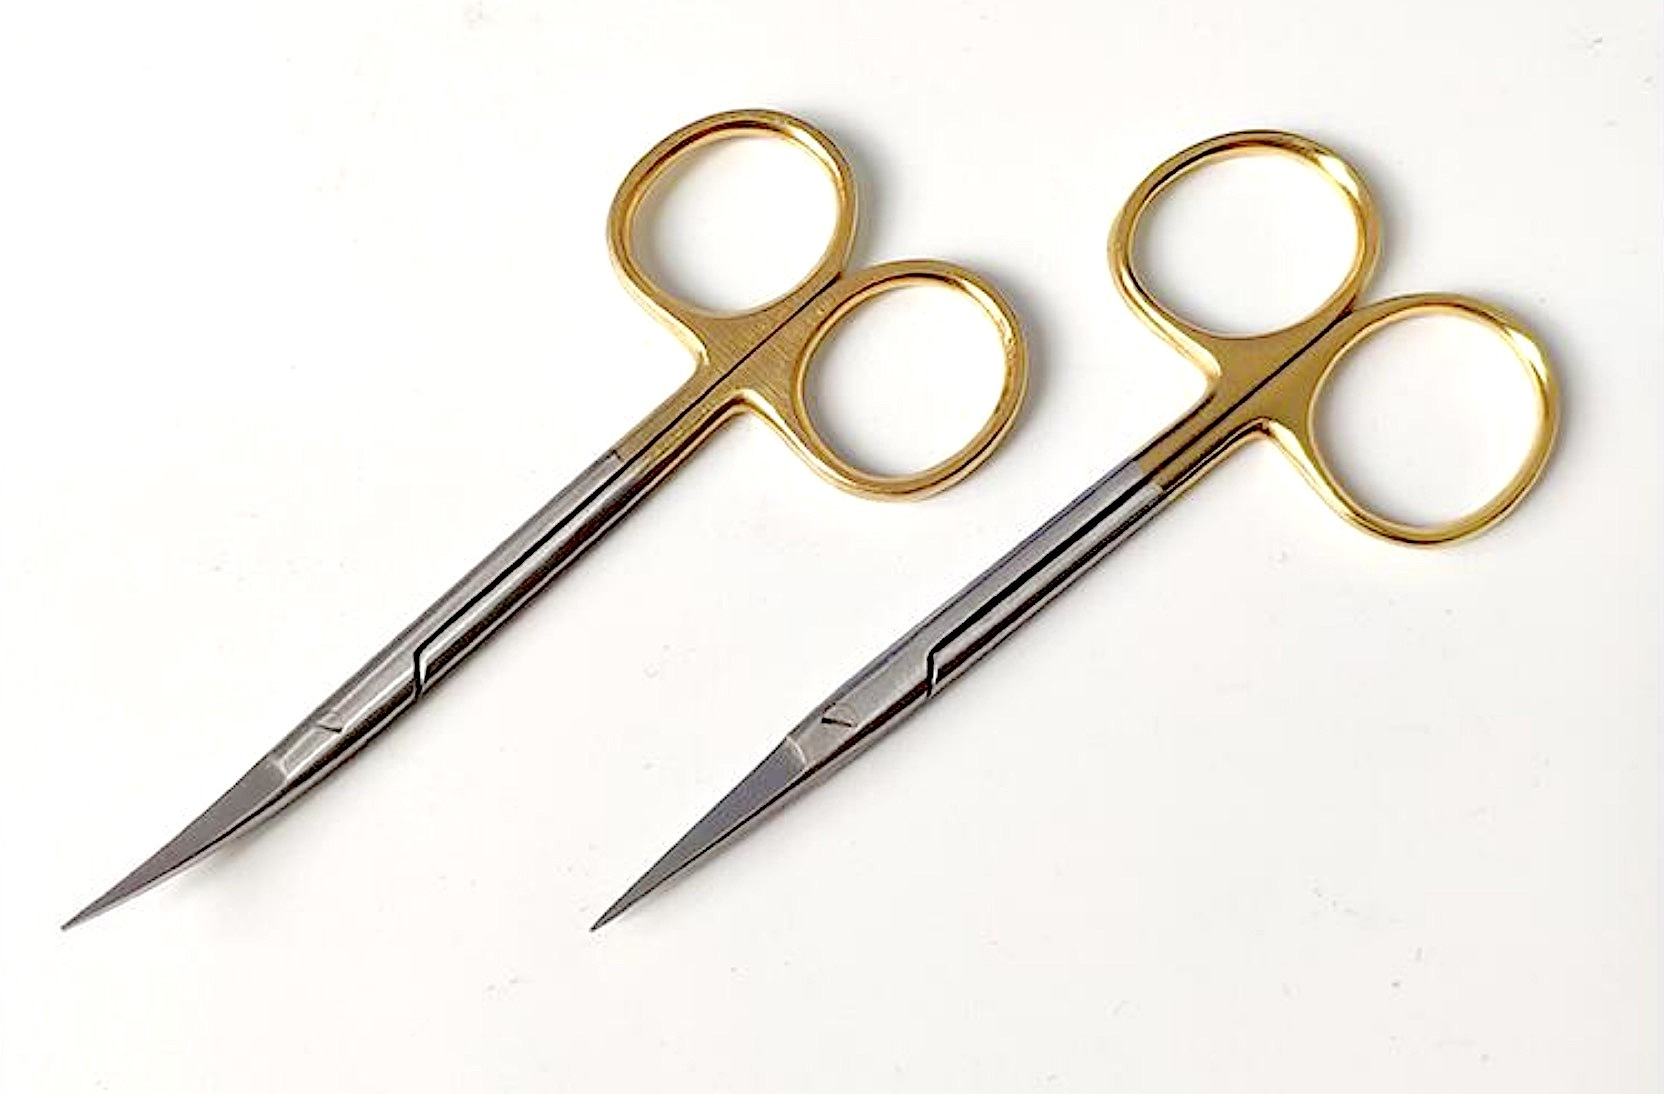 Standard Tying Scissors 100-22G